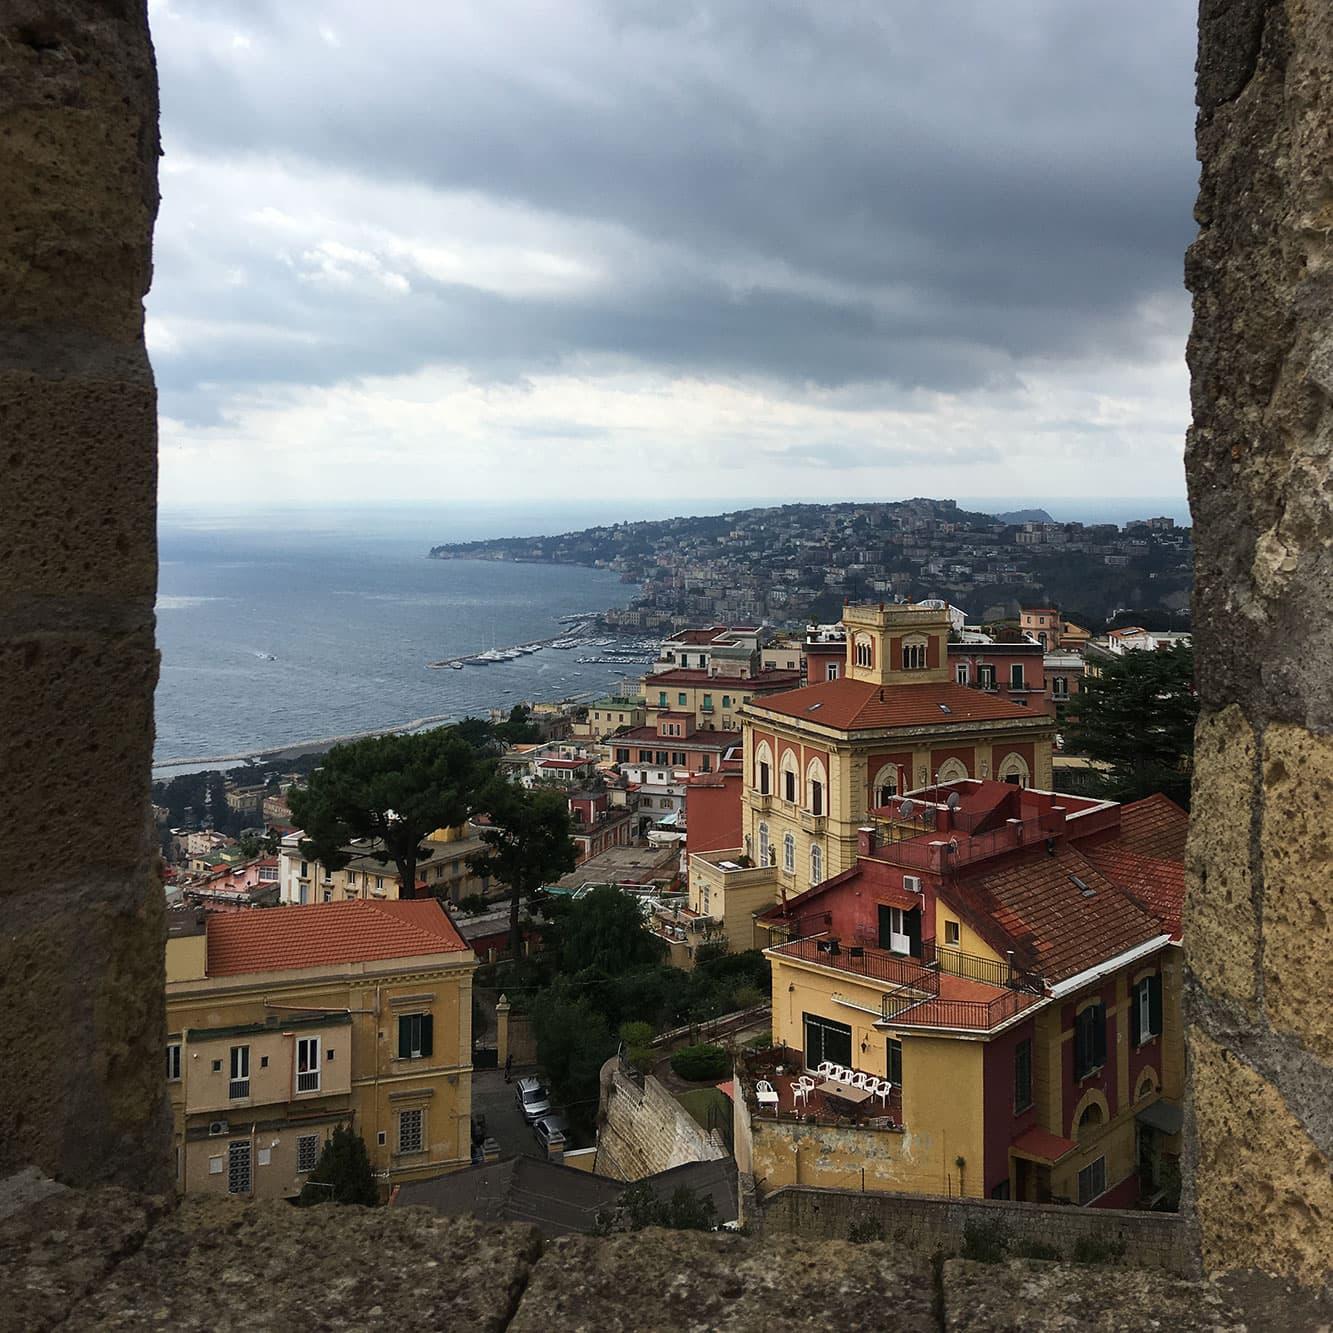 Looking towards Mergellina from Castel Sant'Elmo